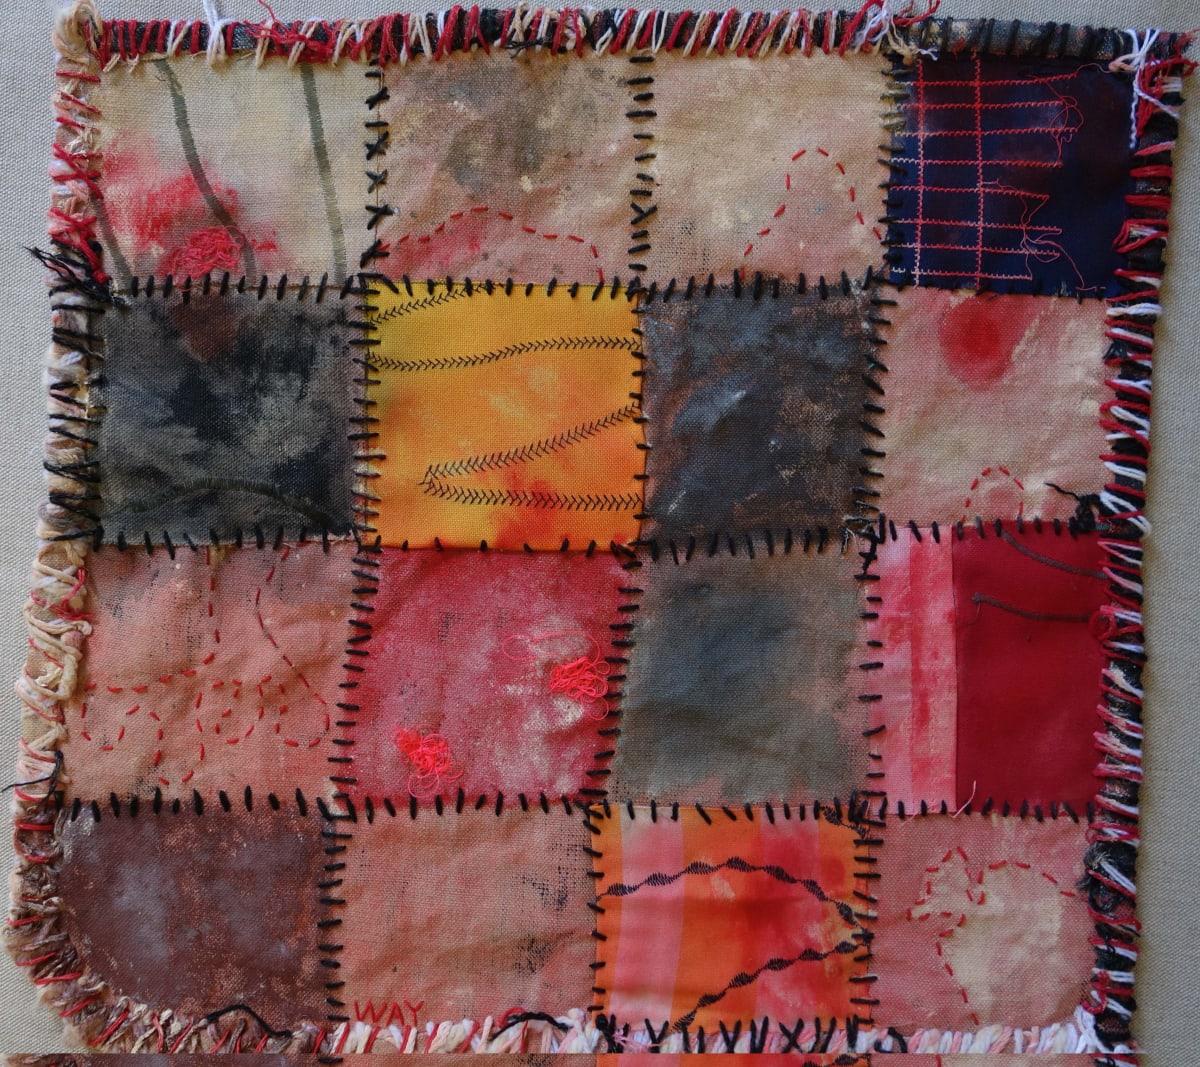 Stephen Eastaugh MUDMAPS 7 (Way) Broome acrylic, thread, linen 45 x 45 cm